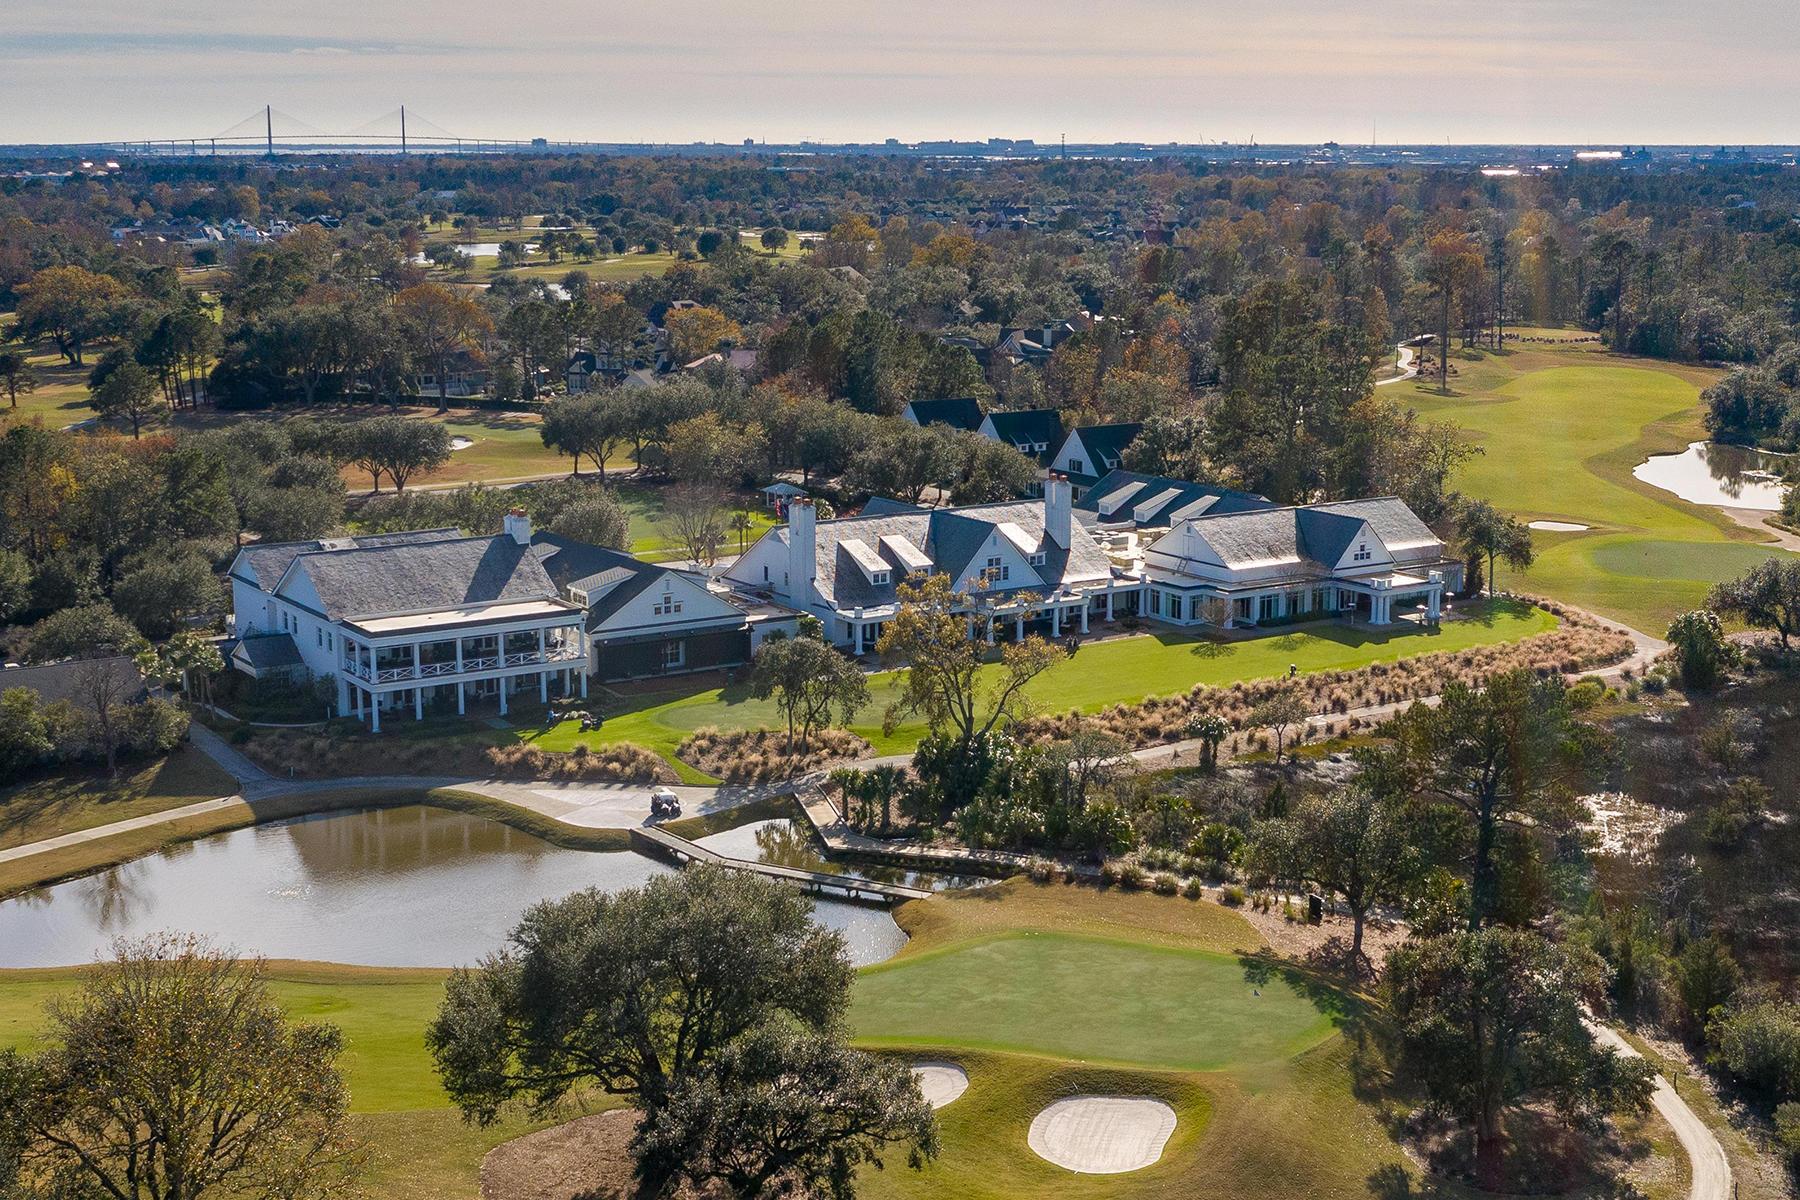 Daniel Island Park Homes For Sale - 555 Lesesne, Charleston, SC - 2